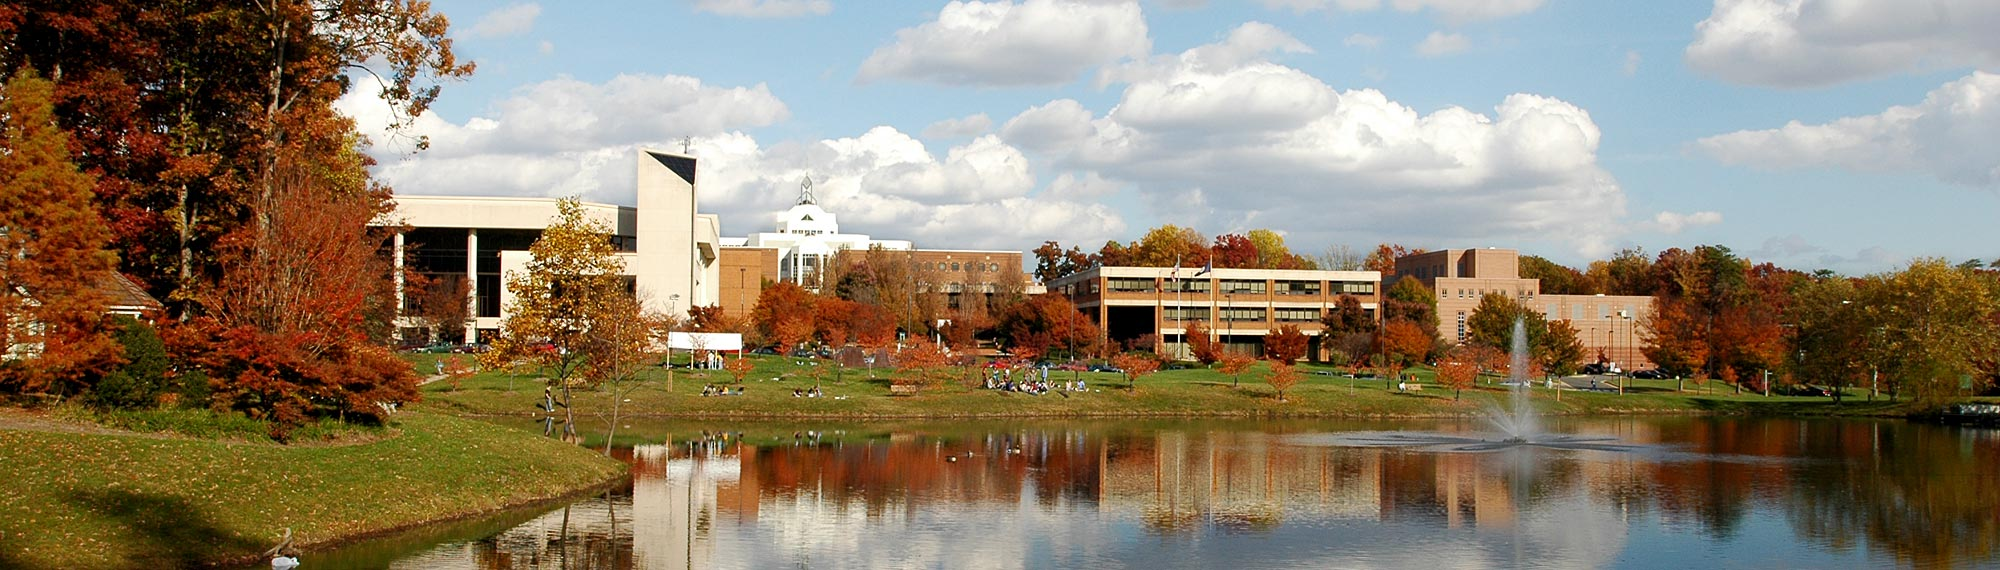 Thrift Prep hails from George Mason University, Fairfax, VA